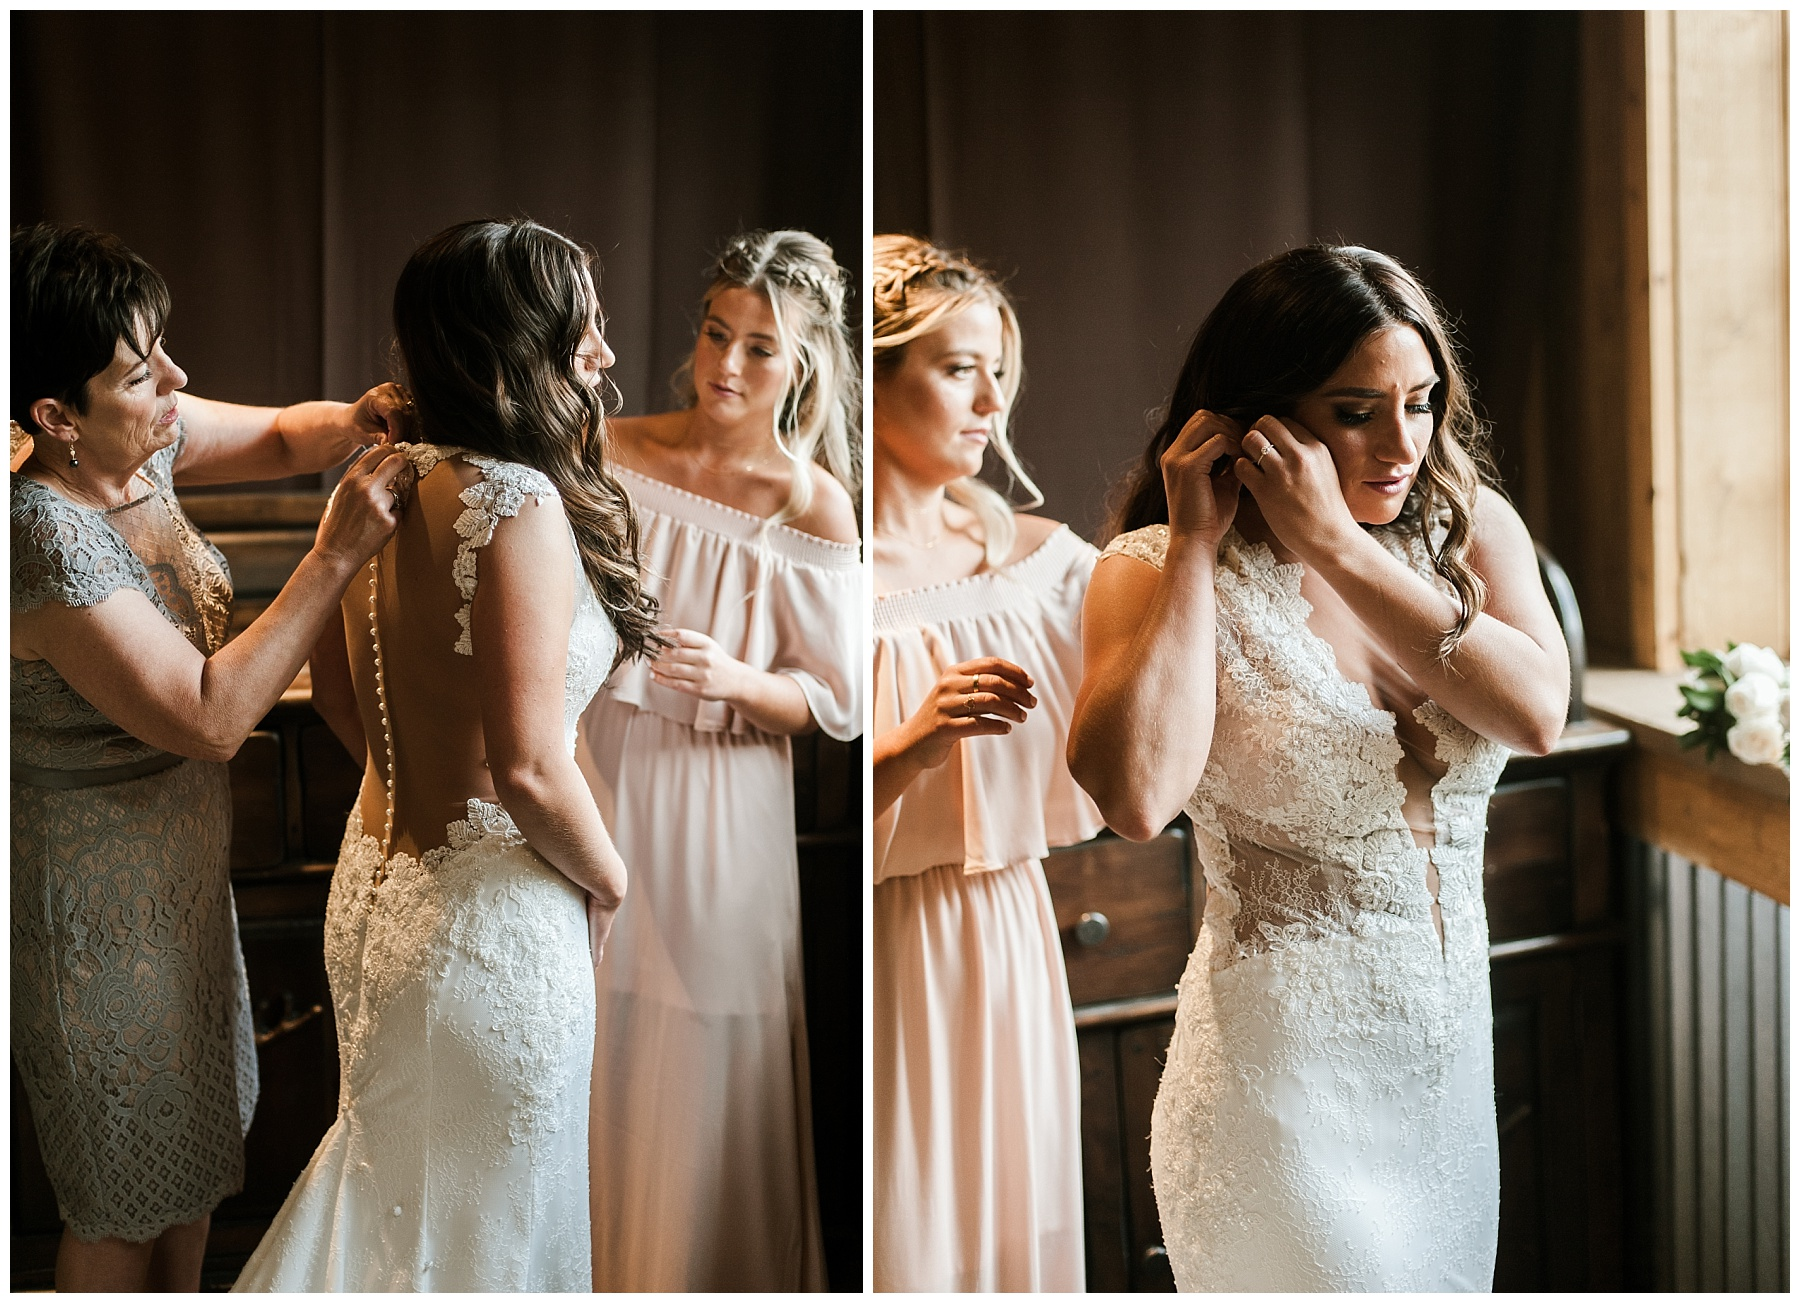 Katesalleyphotography-109_married in Breckenridge.jpg